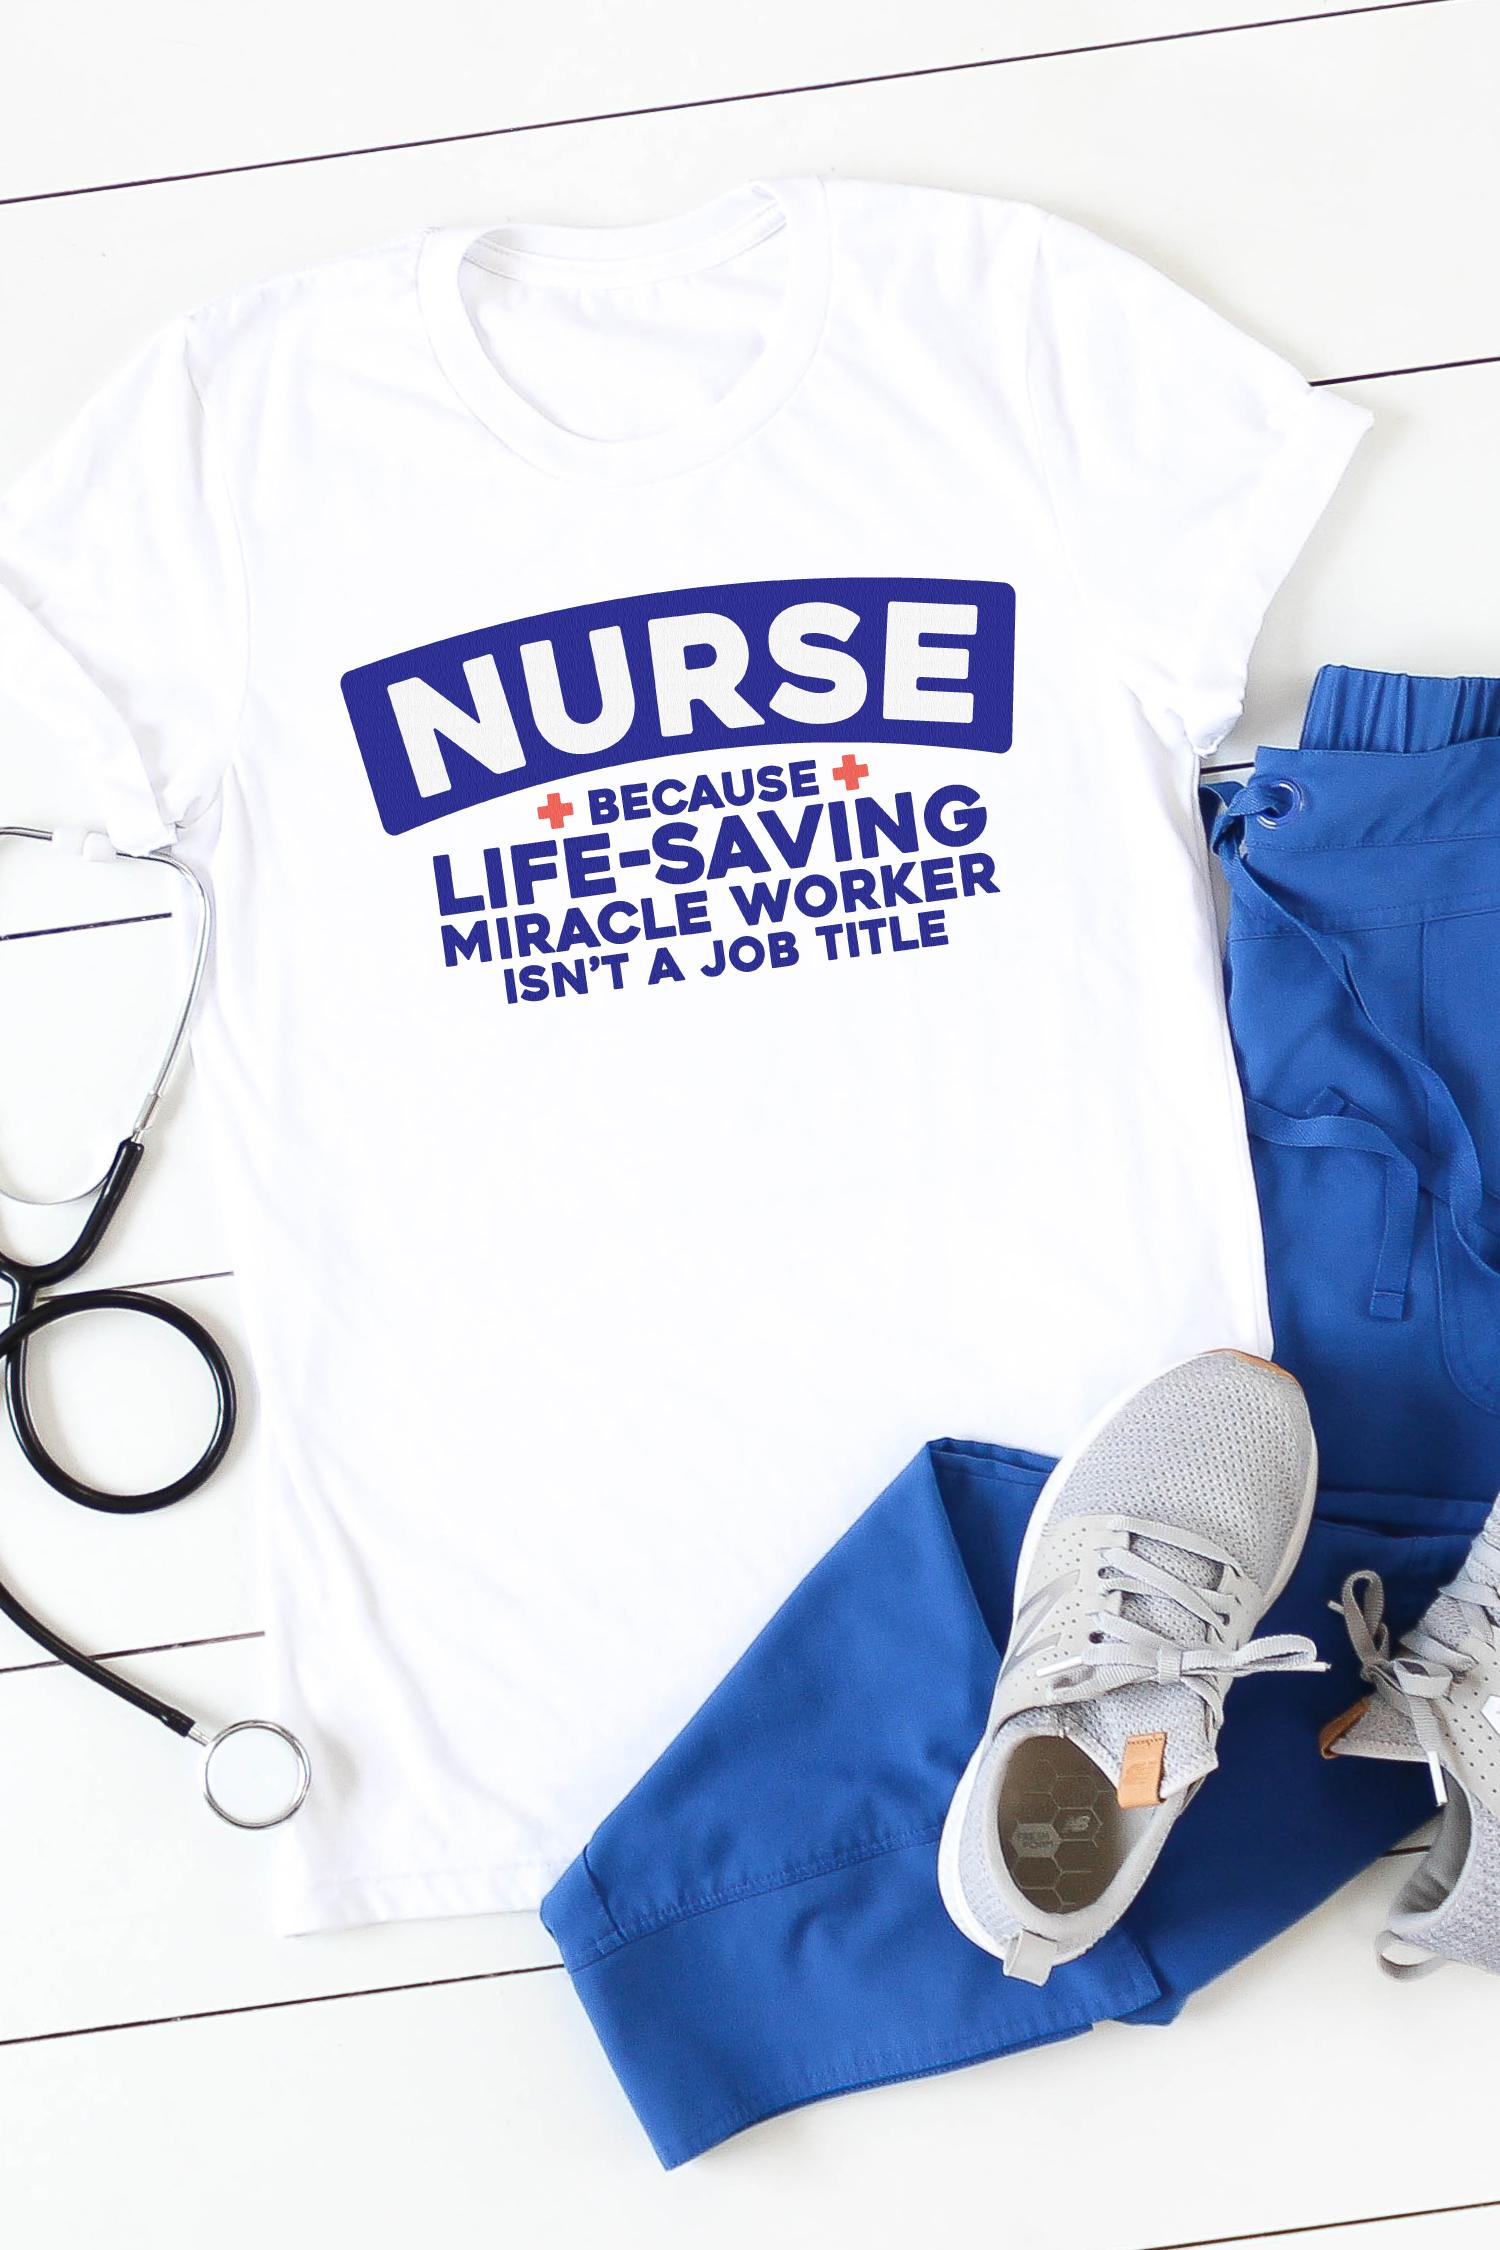 Free Nurse Svg 15 Healthcare Worker Cut Files Hey Let S Make Stuff